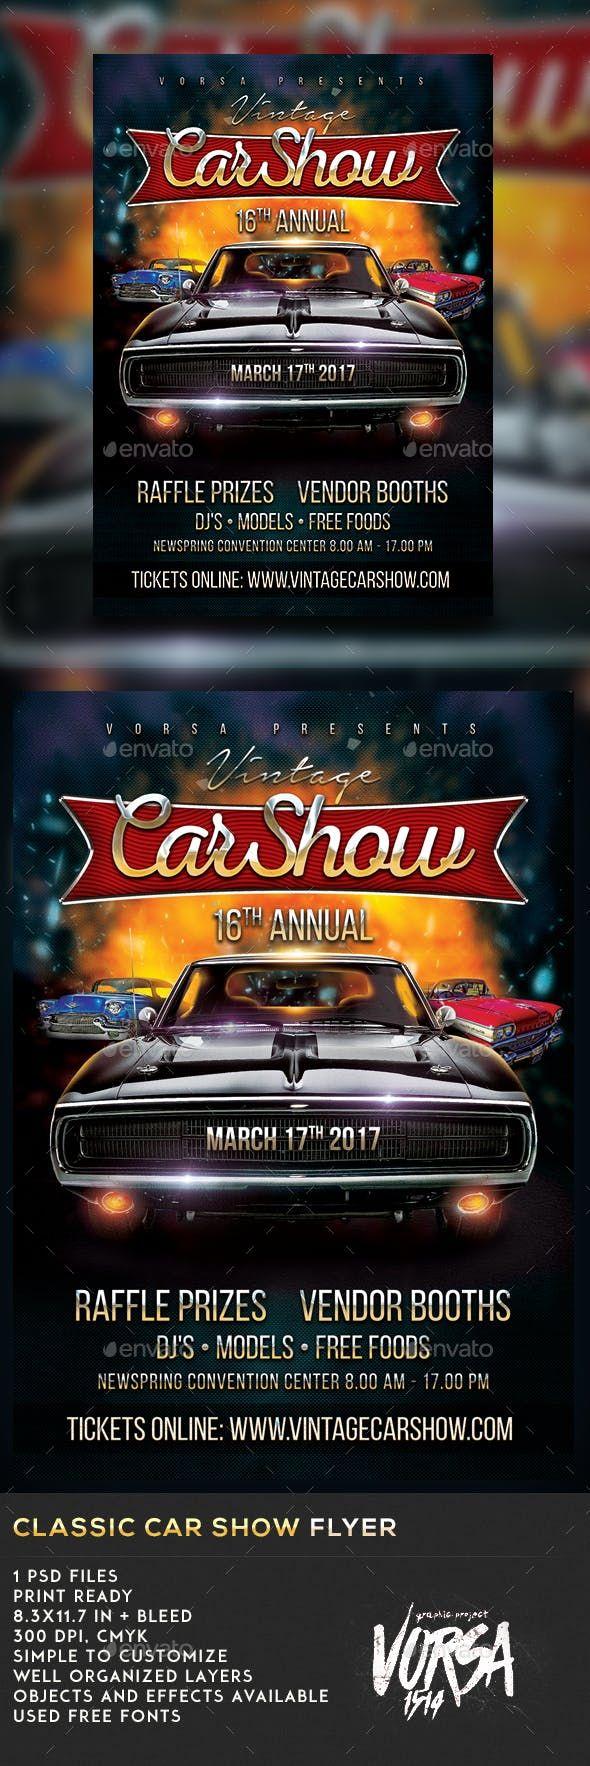 Classic Car Show Flyer — Photoshop PSD #chrome #motor